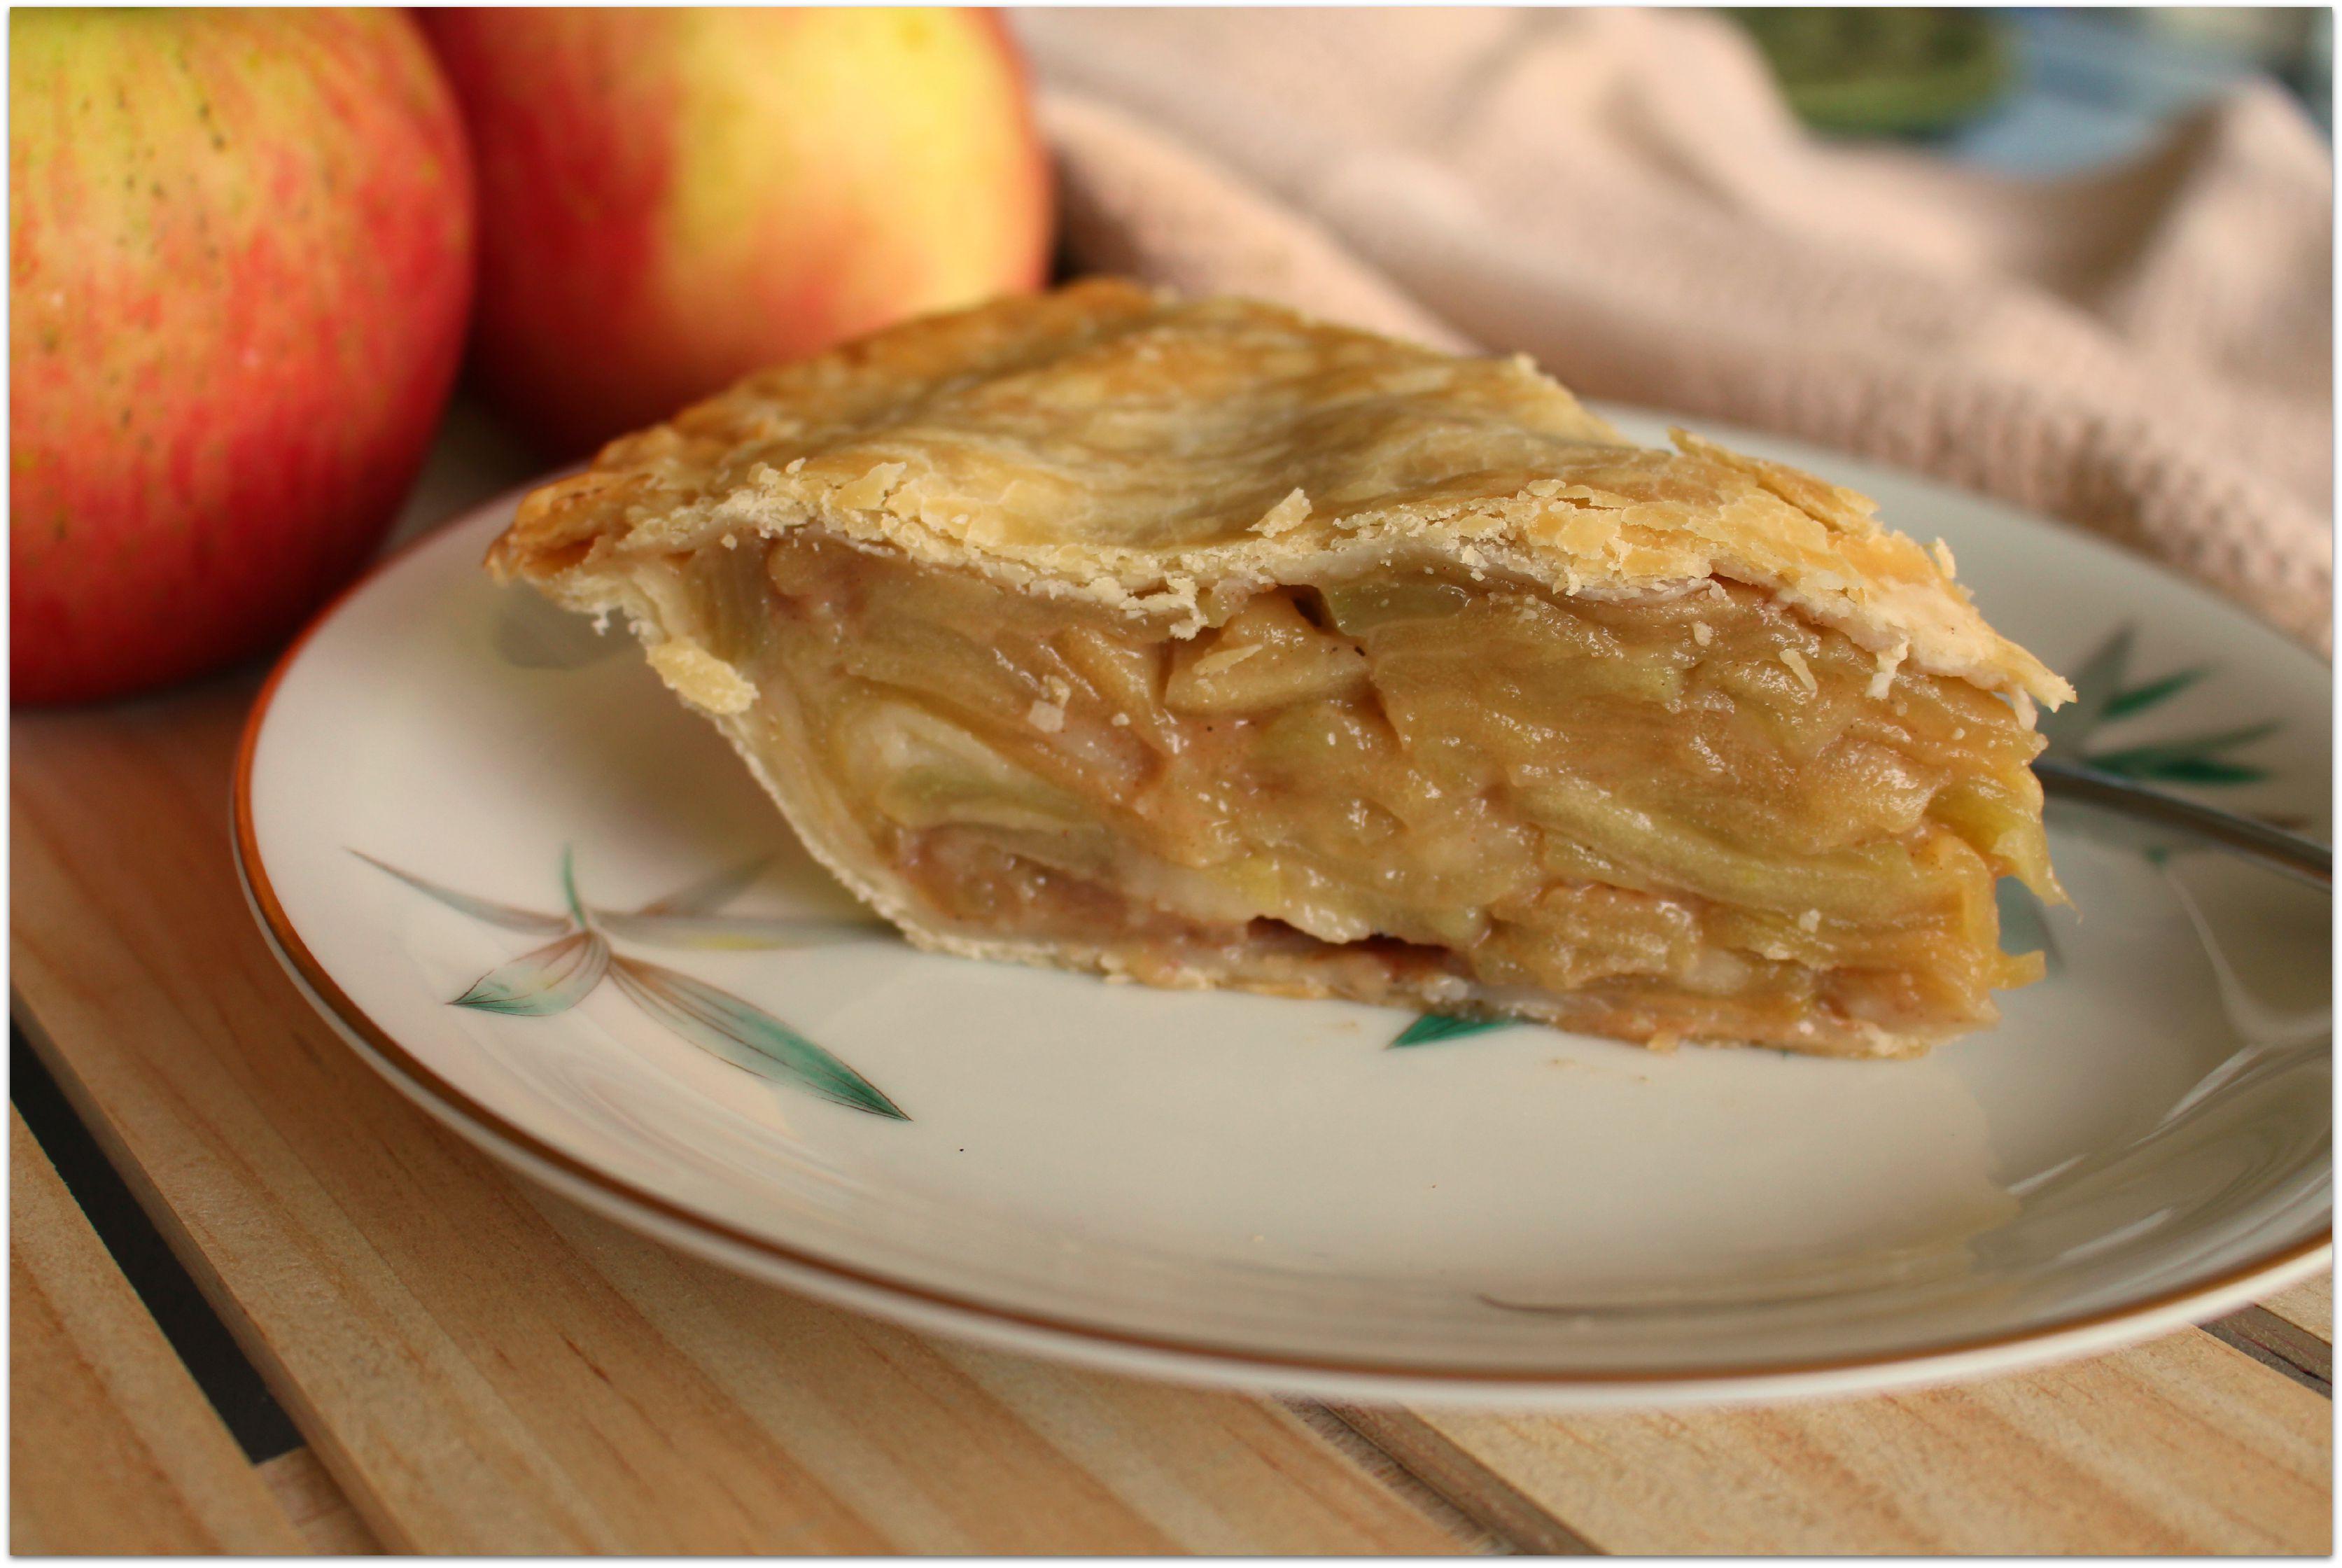 Easy Homemade Apple Pie  Delicious & Easy Homemade Apple Pie Recipe Food Fun